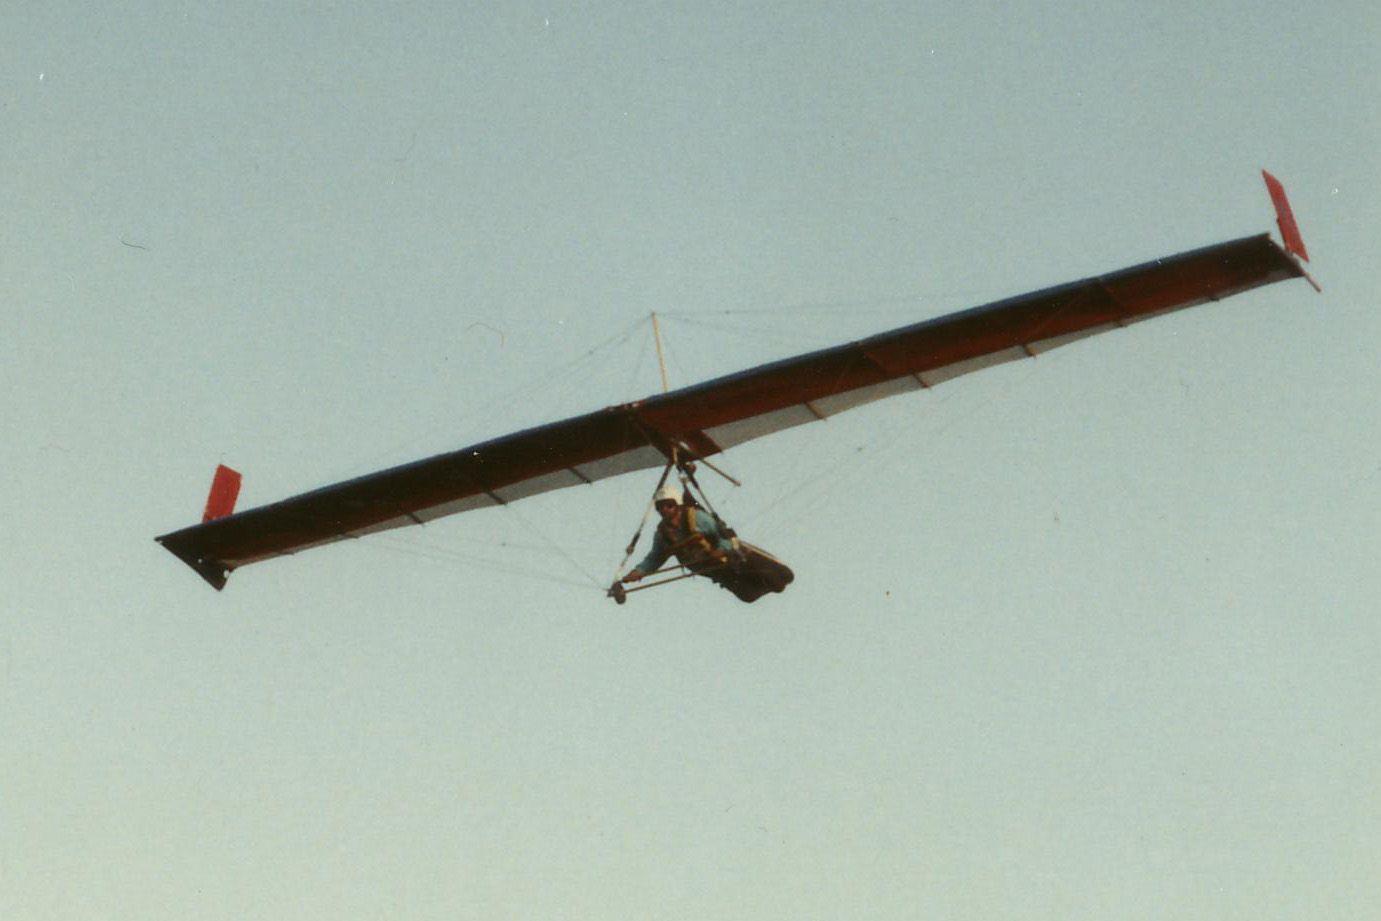 Homemade Car Plans | Homemade Hang Glider | plans | Gliders